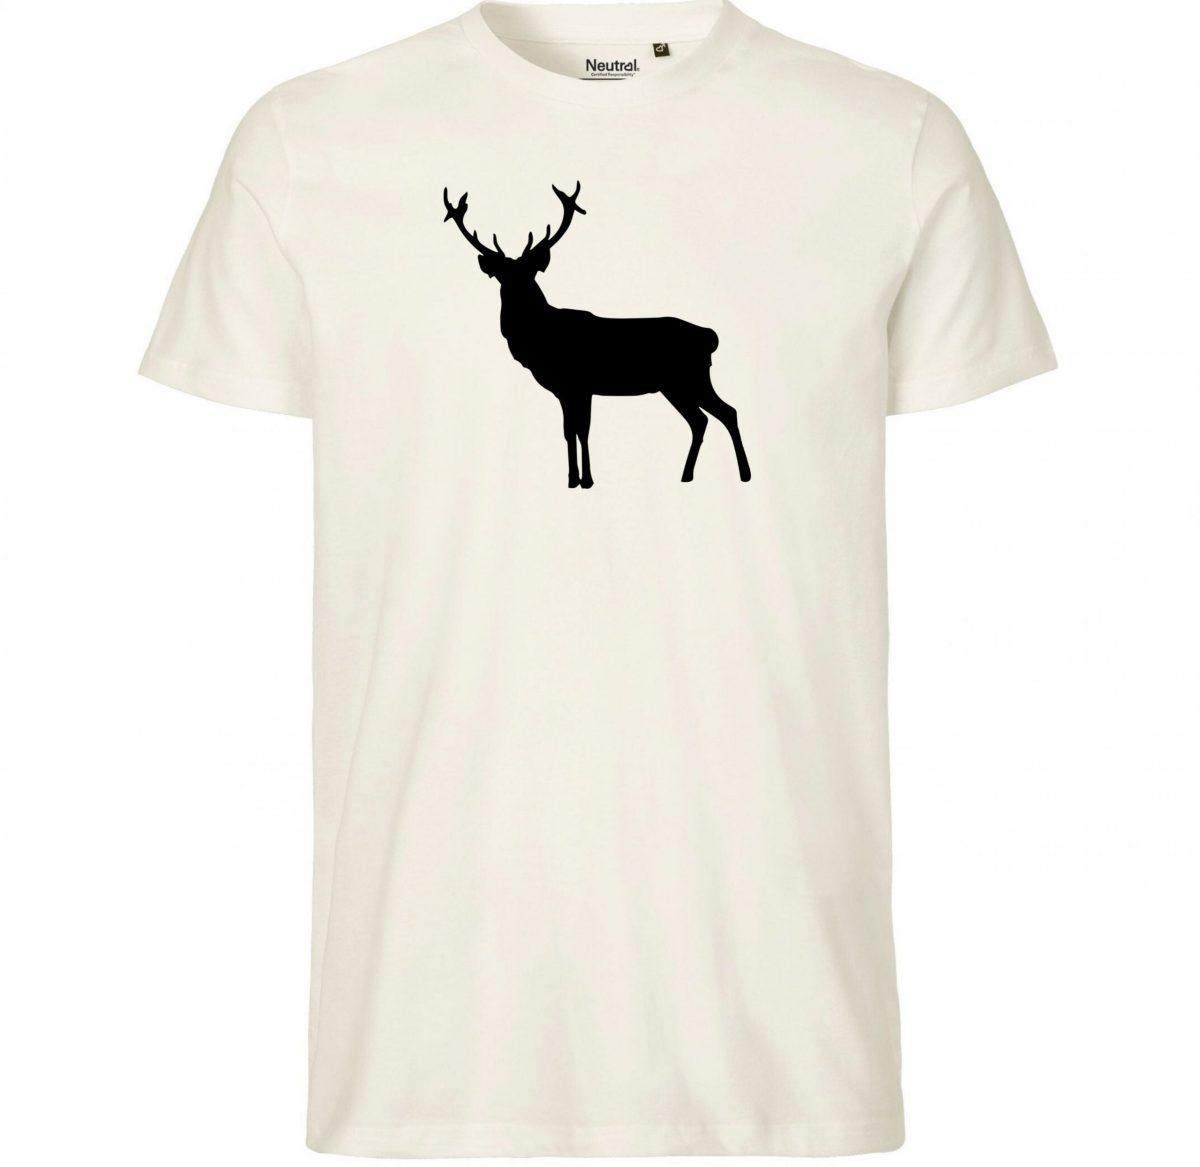 Tee-Shirt Homme – Un Cerf